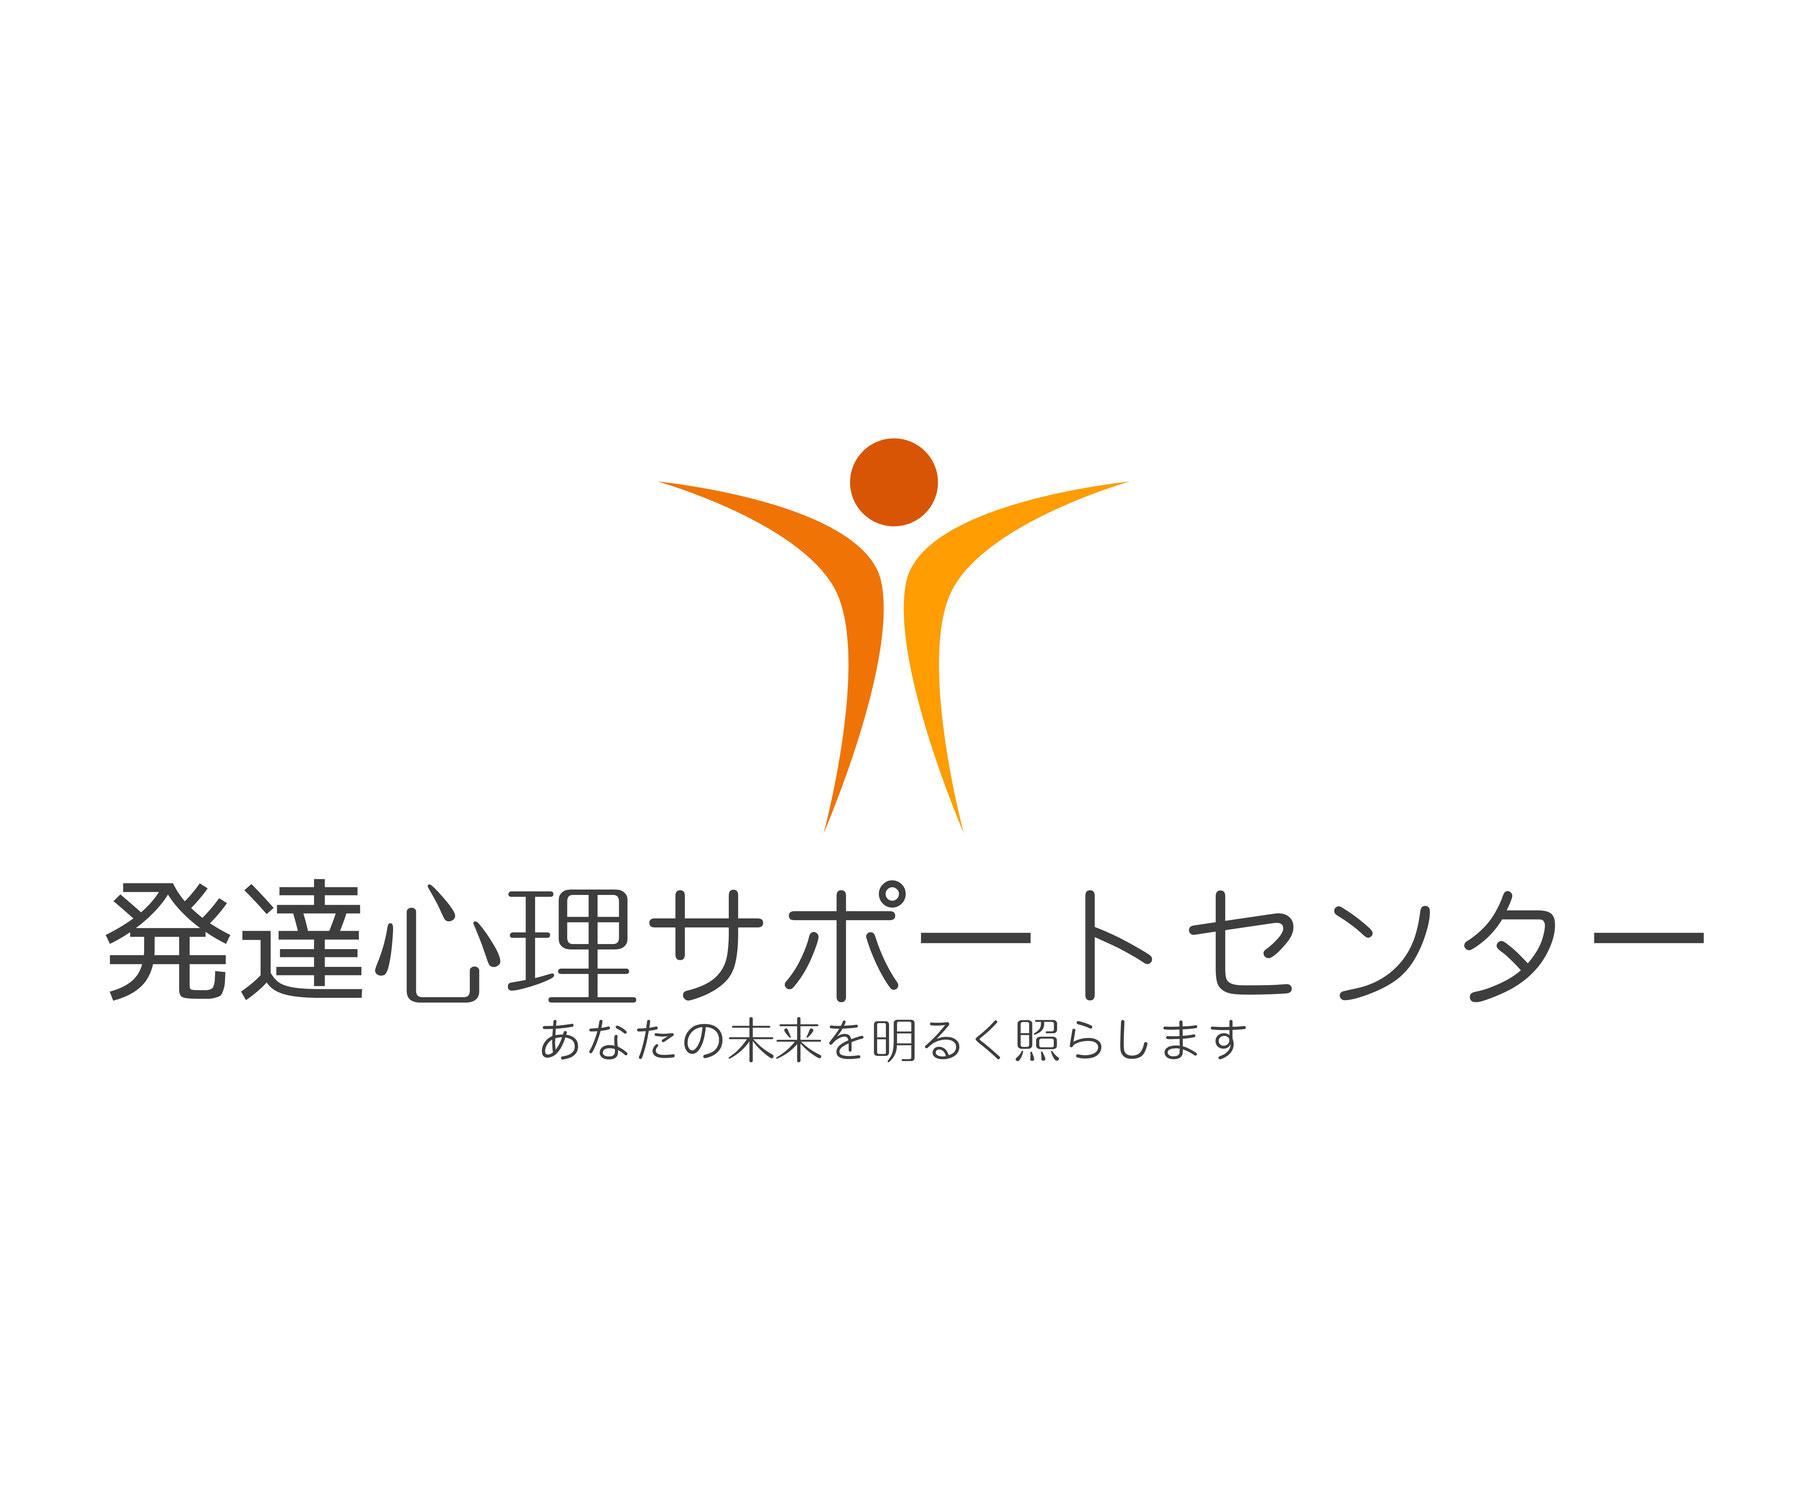 053【WISC-Ⅳ】WISC4検査のPRI(知覚推理指標)の伸ばし方